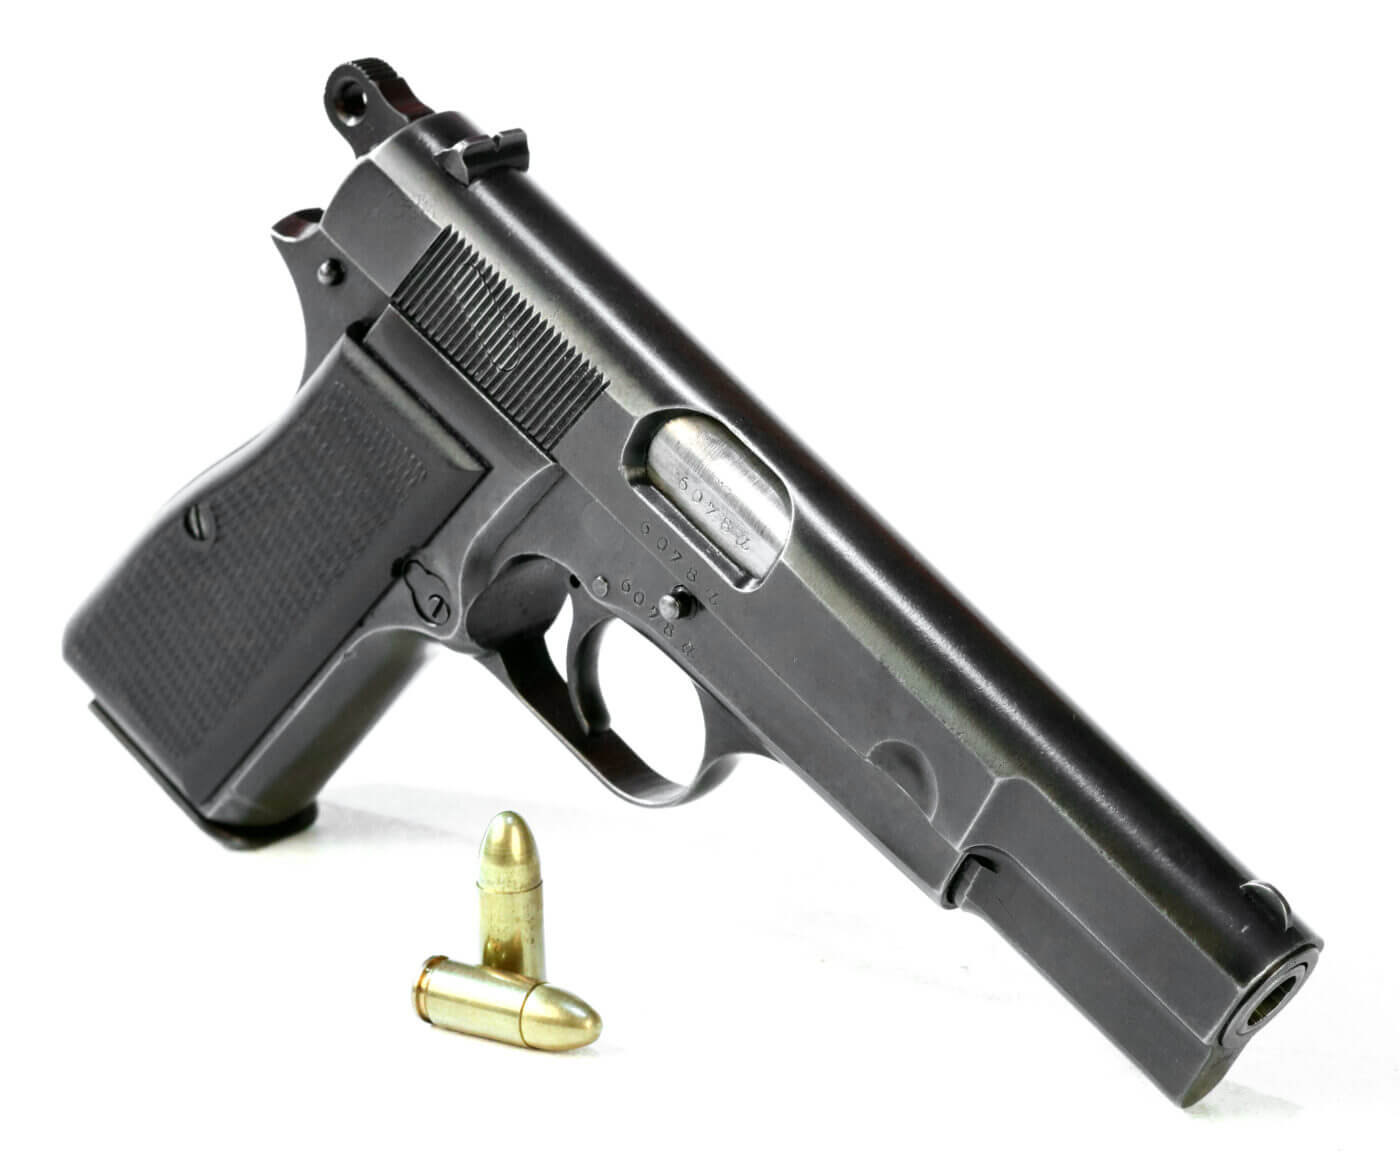 GP35 Hi-Power pistol